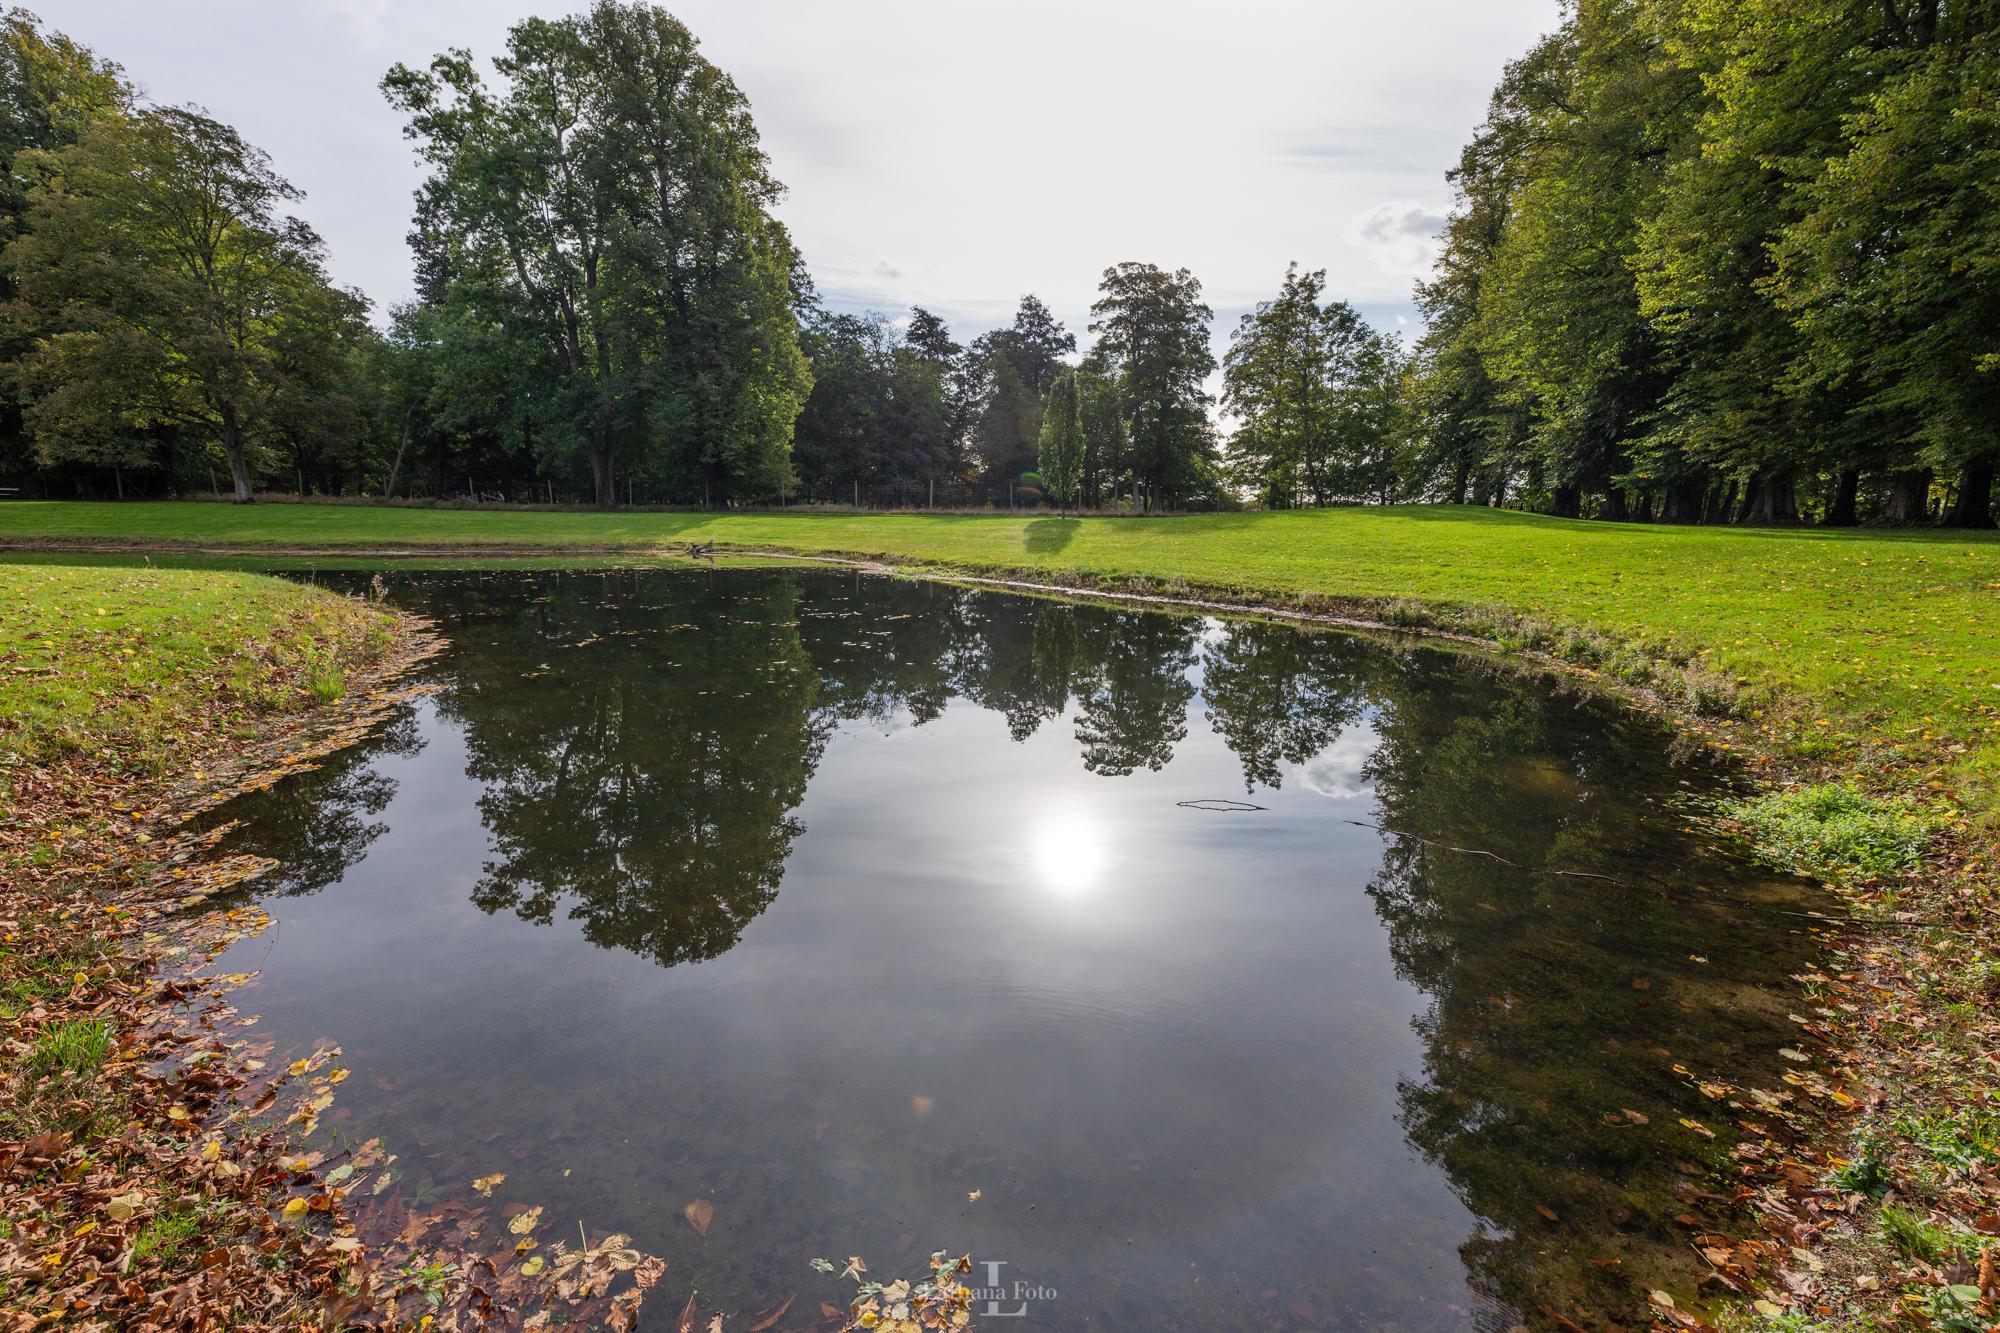 løvenborg slot 181020 9